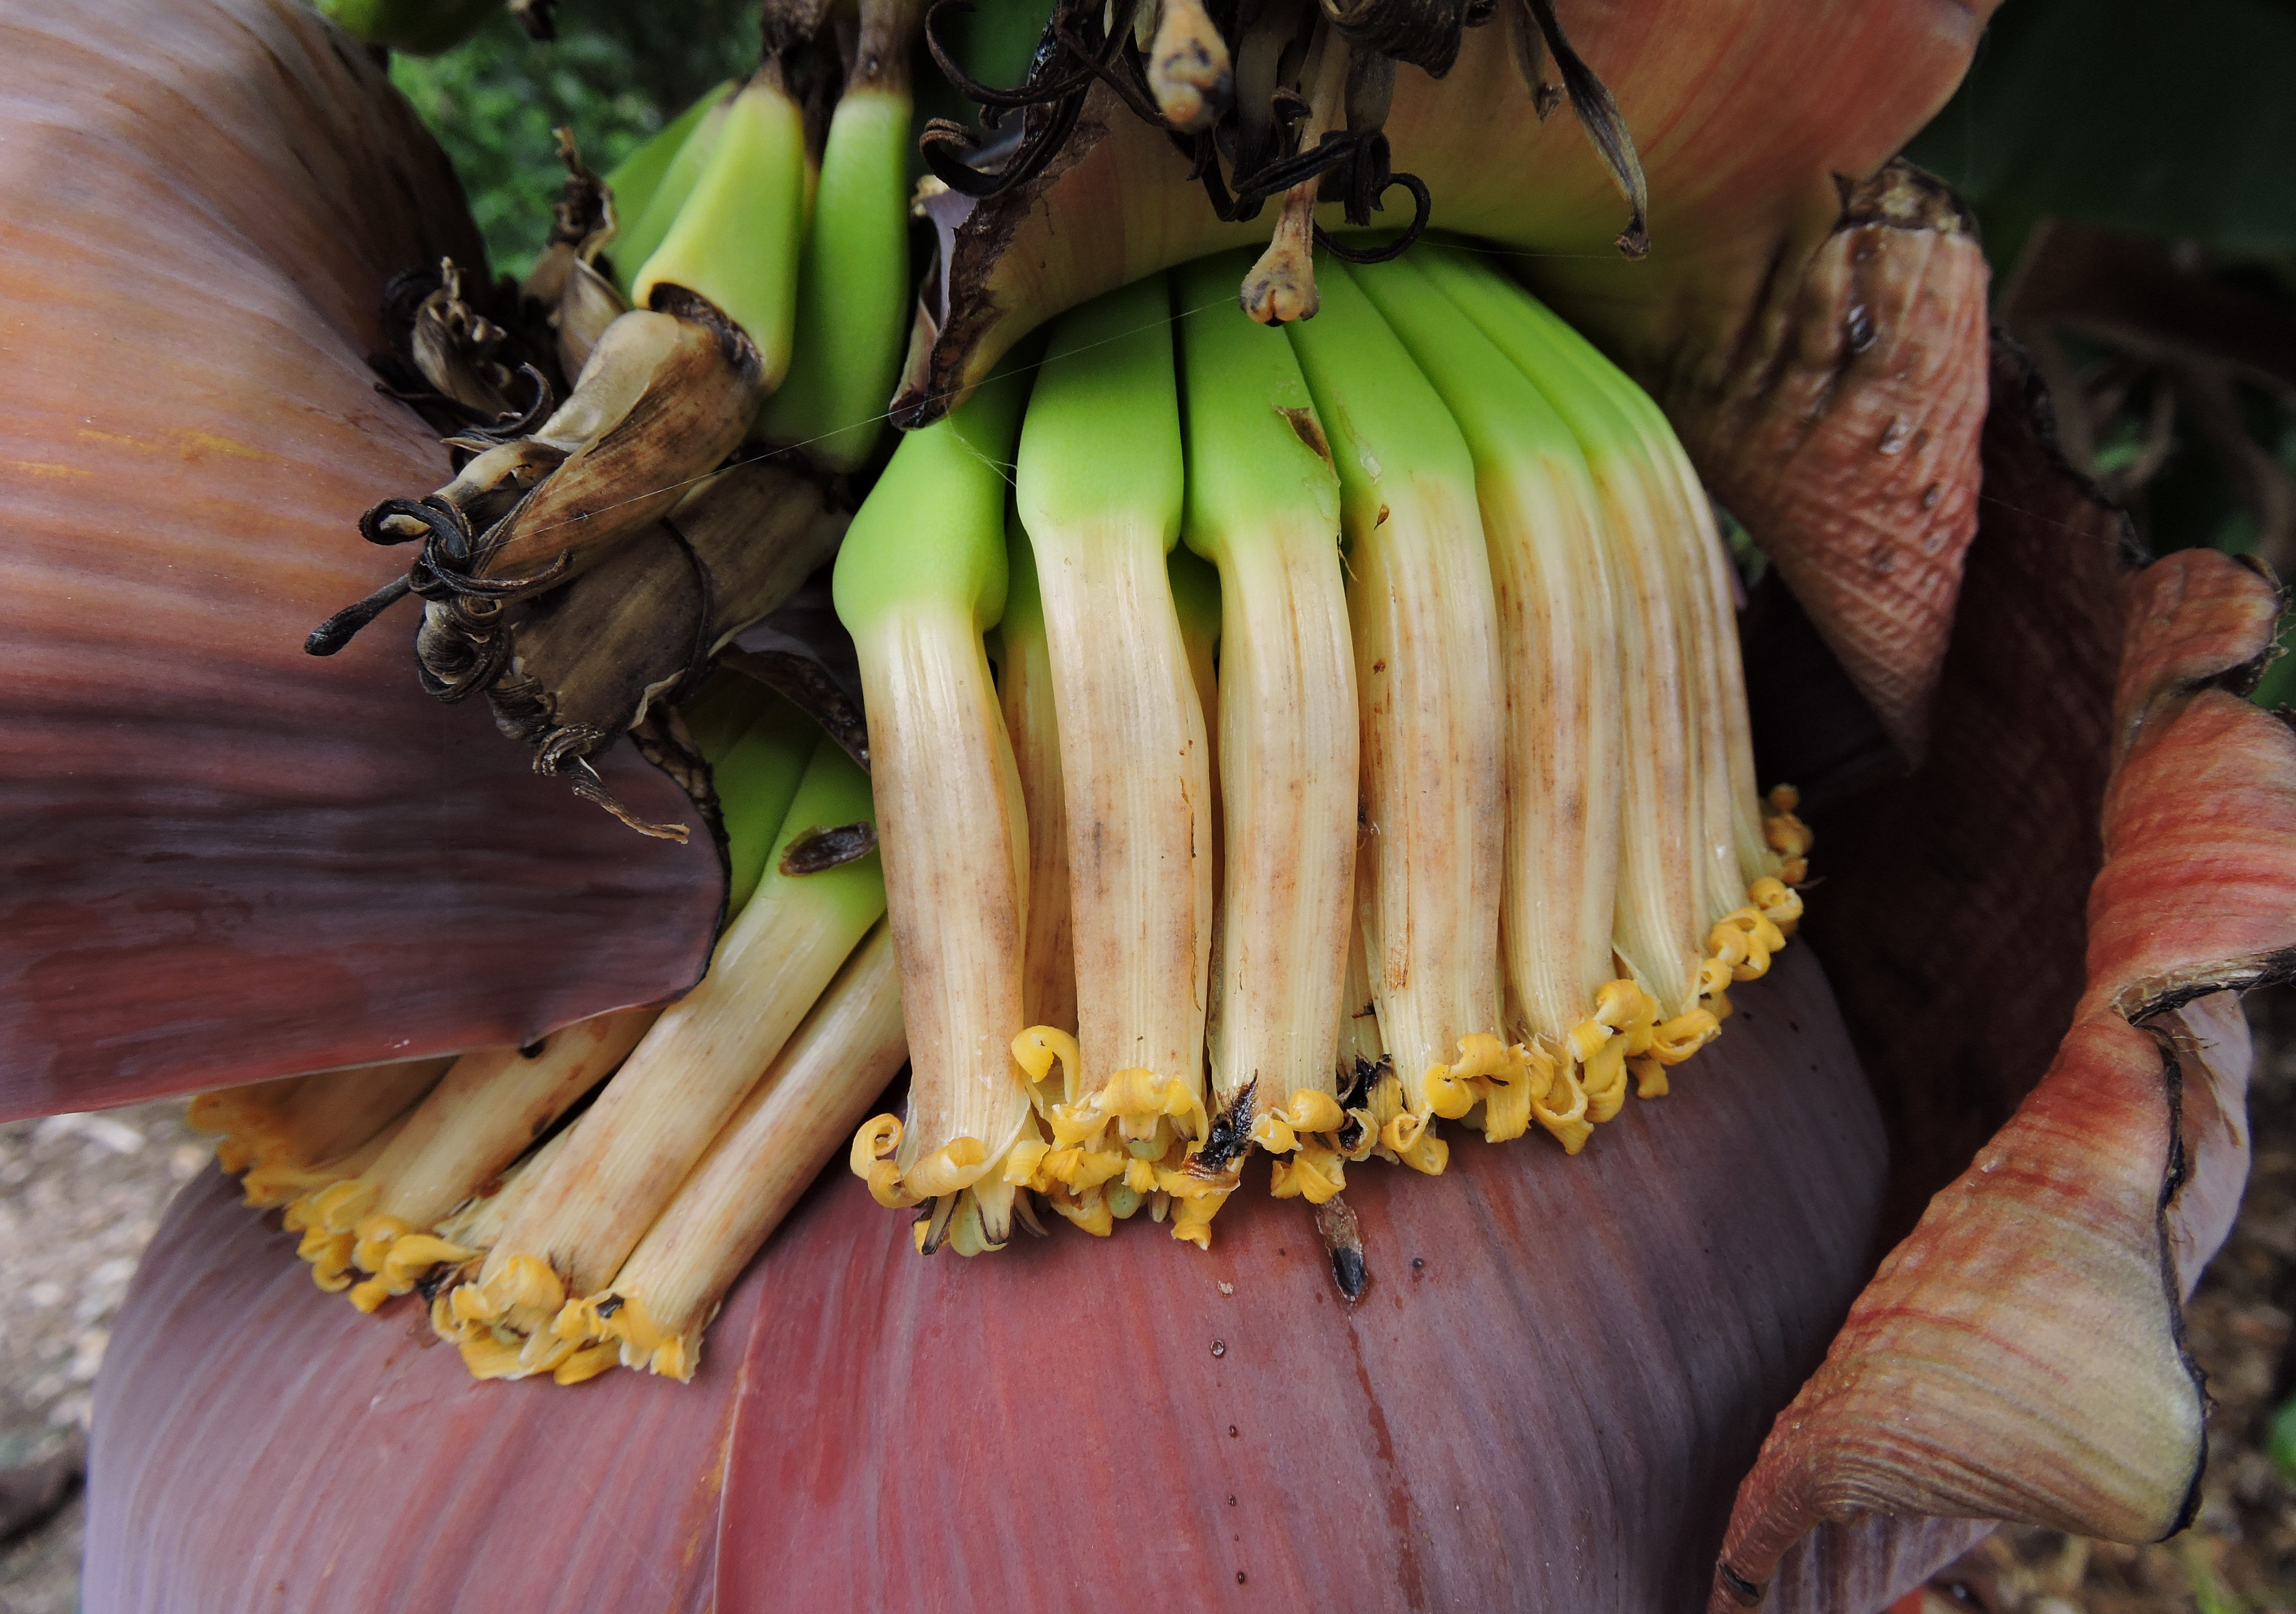 musa acuminata recycling banana peelings into Explore log in create new account upload.